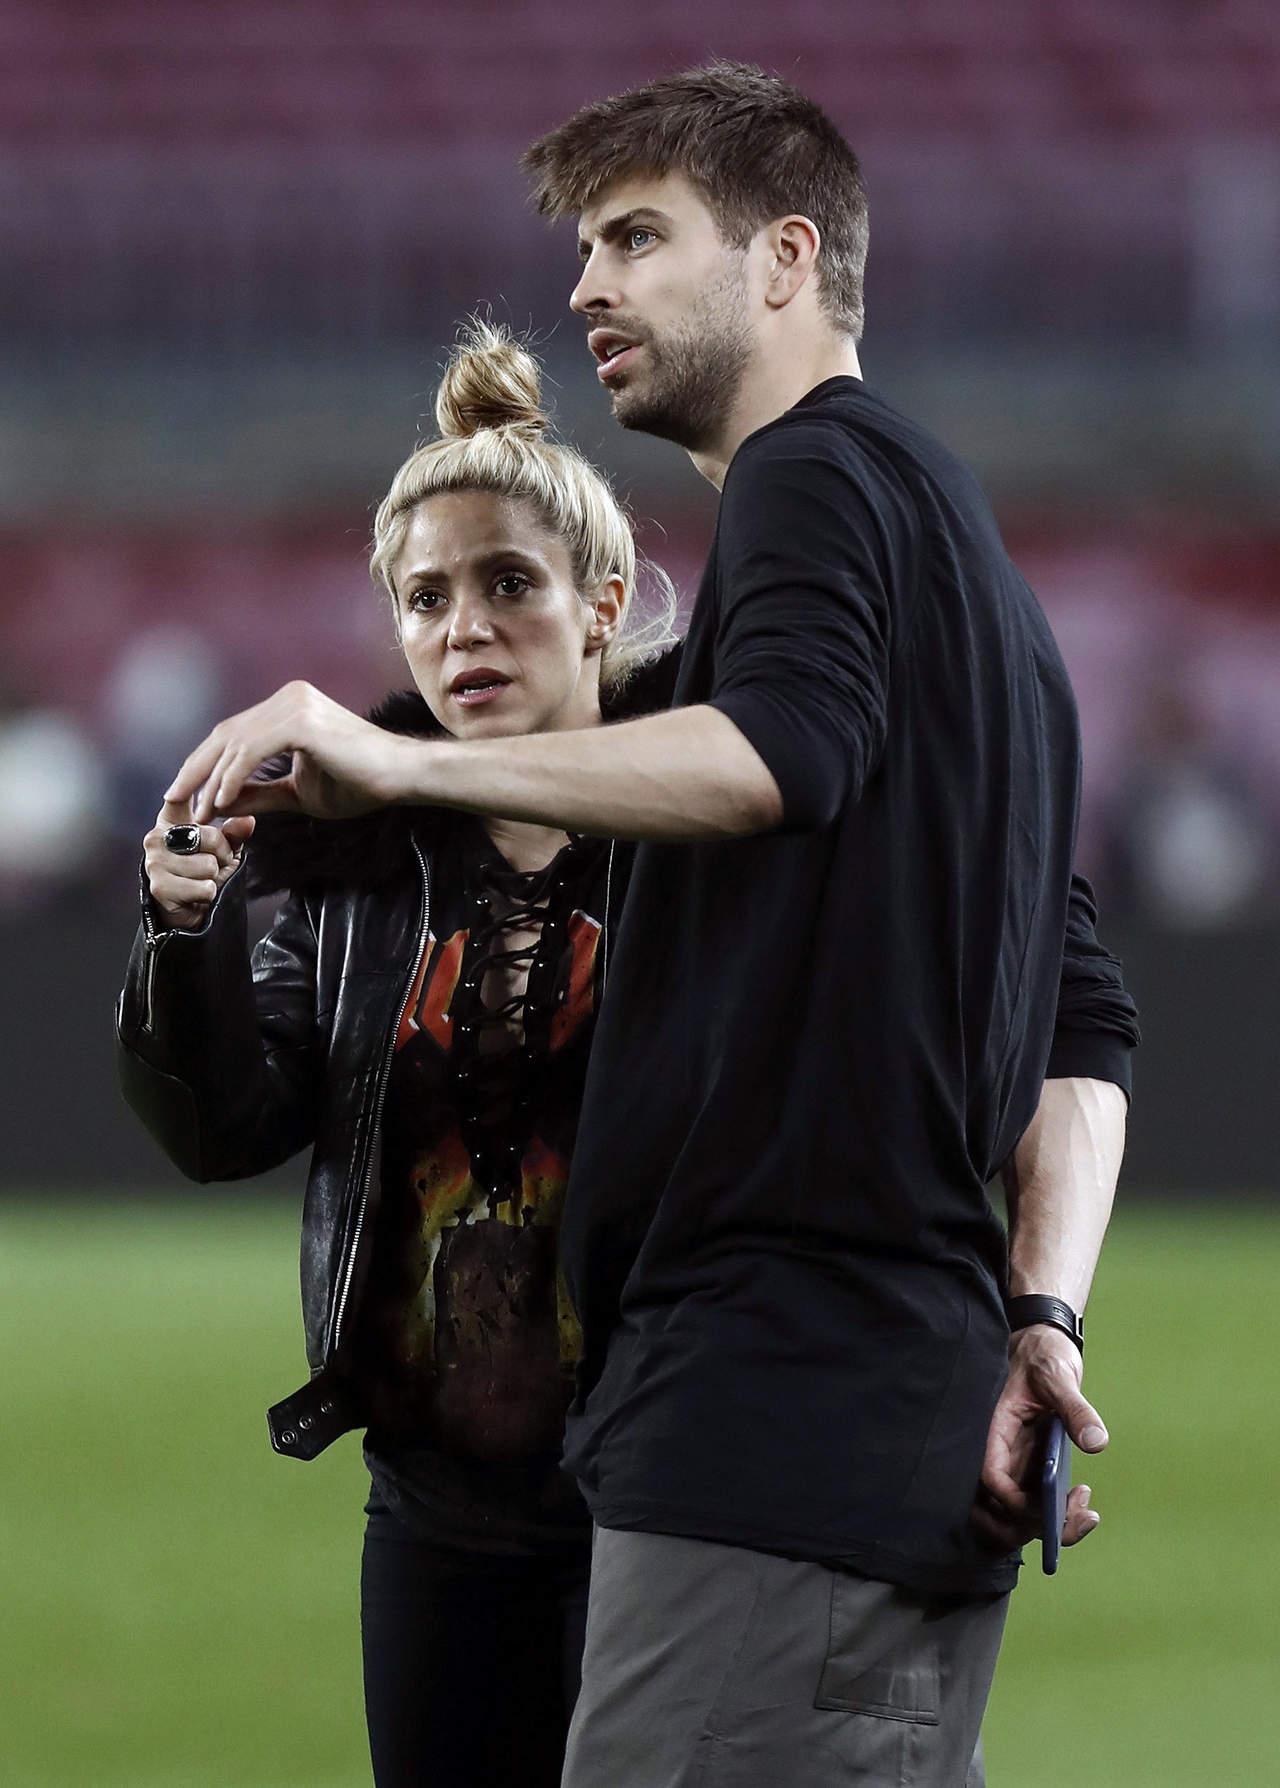 Piqué hace llorar a Shakira durante discusión en público